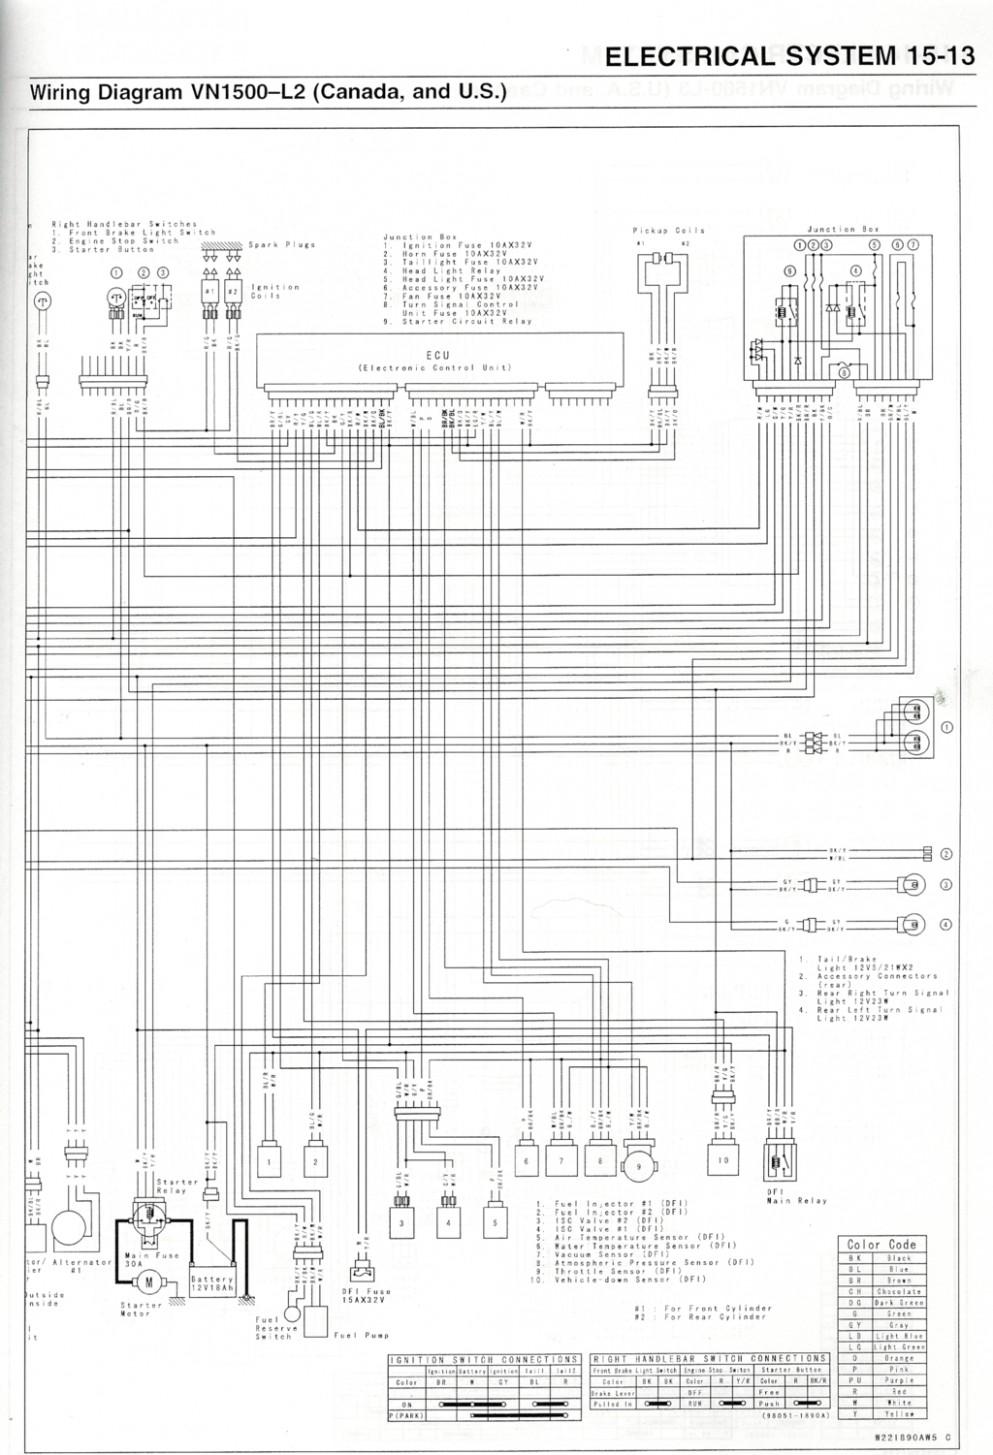 hyundai atos fuse box diagram wiring diagram hyundai santro india lair 19 espressotage de  wiring diagram hyundai santro india